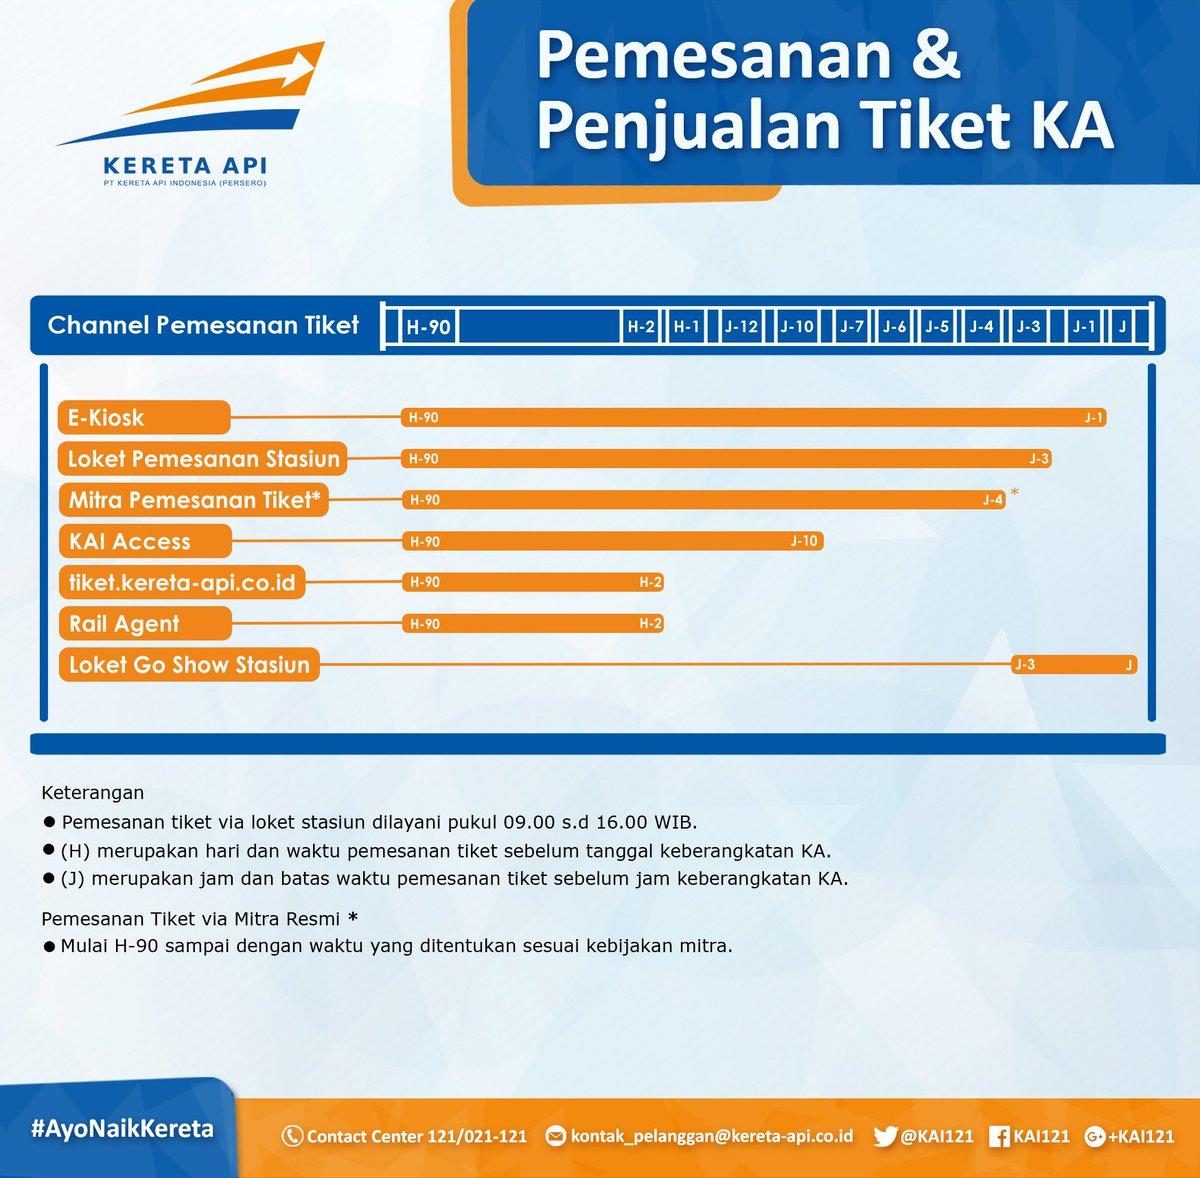 Kereta Api Indonesia On Twitter Pemesanan Tiket Kereta Api Semakin